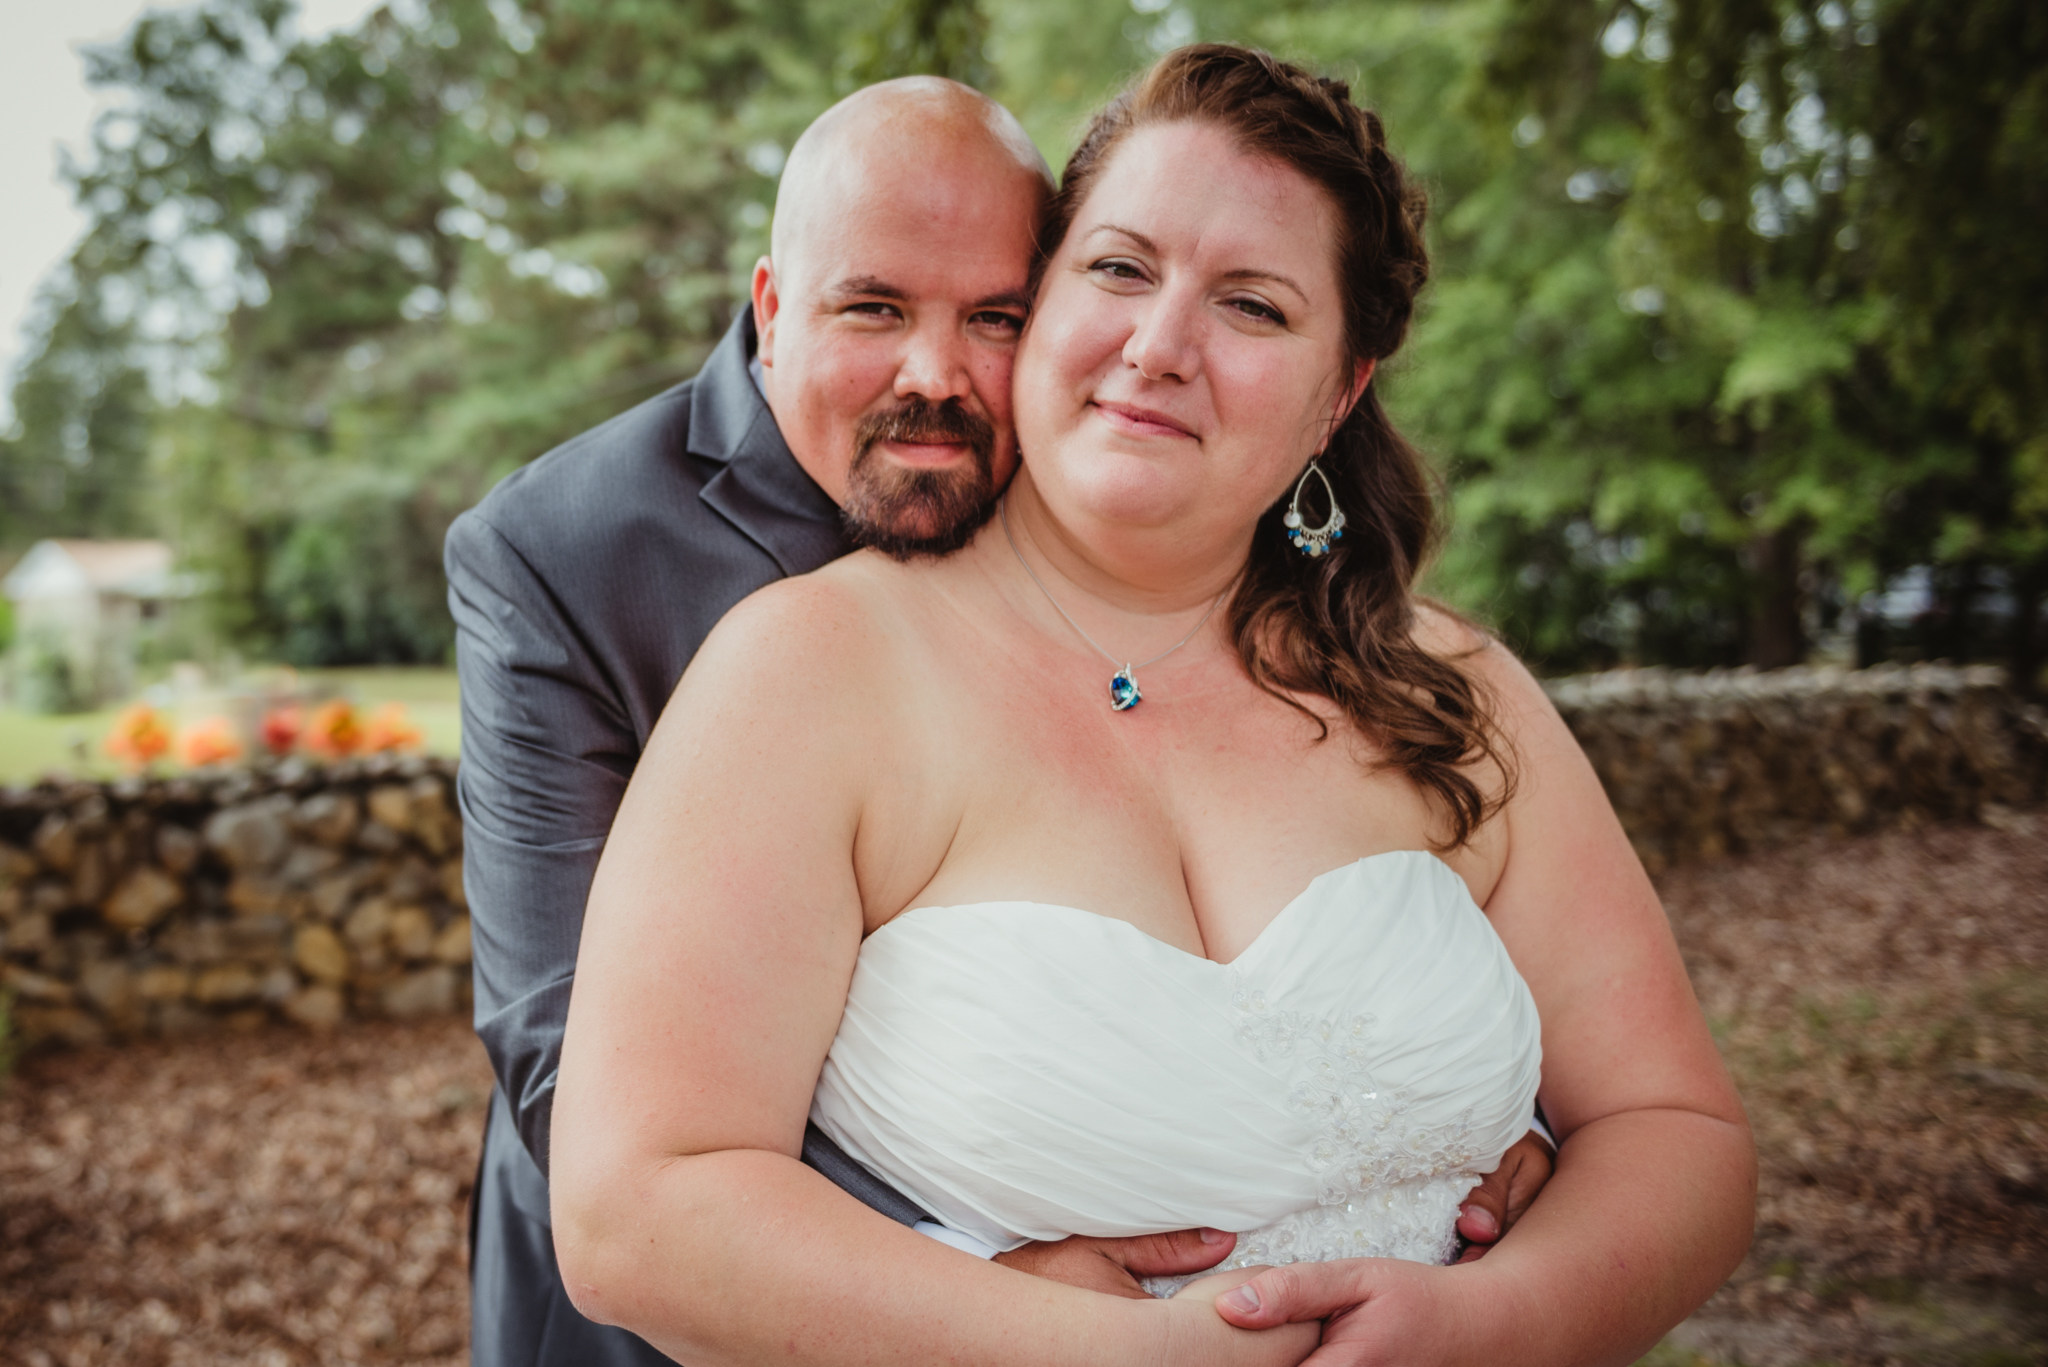 raleigh-wedding-bride-and-groom-portraits-cd-4.jpg